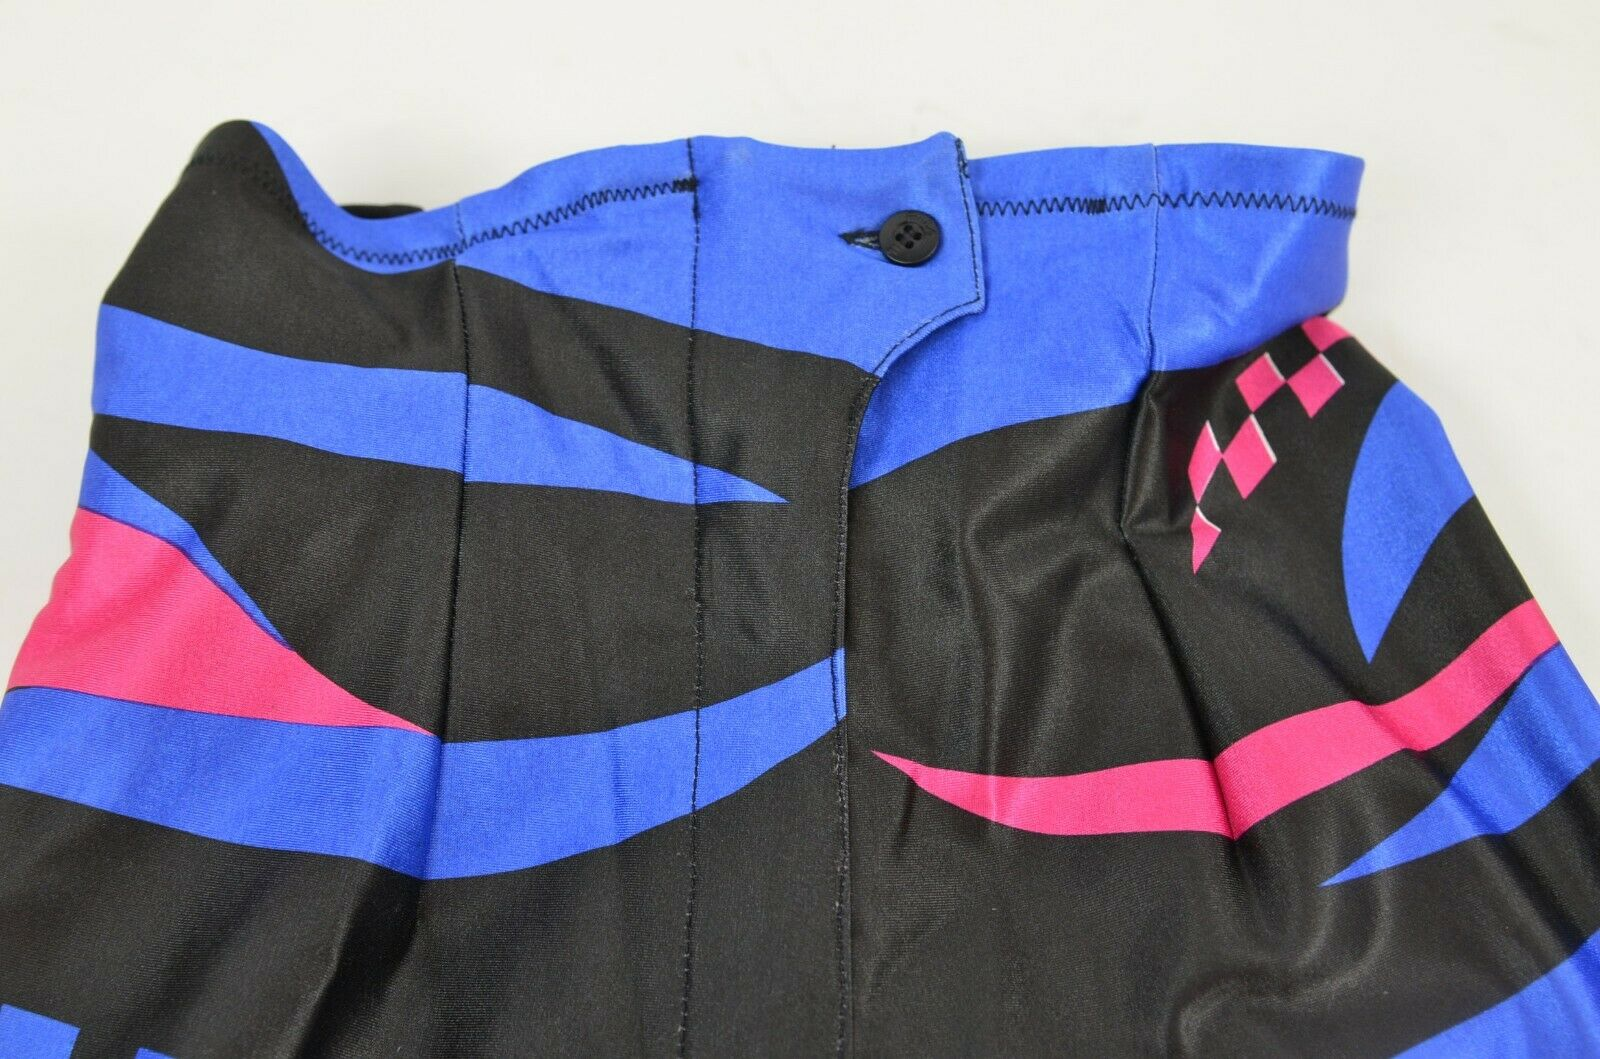 Fila Sportswear Women's Pants Size 5 Retro colorful Zip Up  Trousers Casual